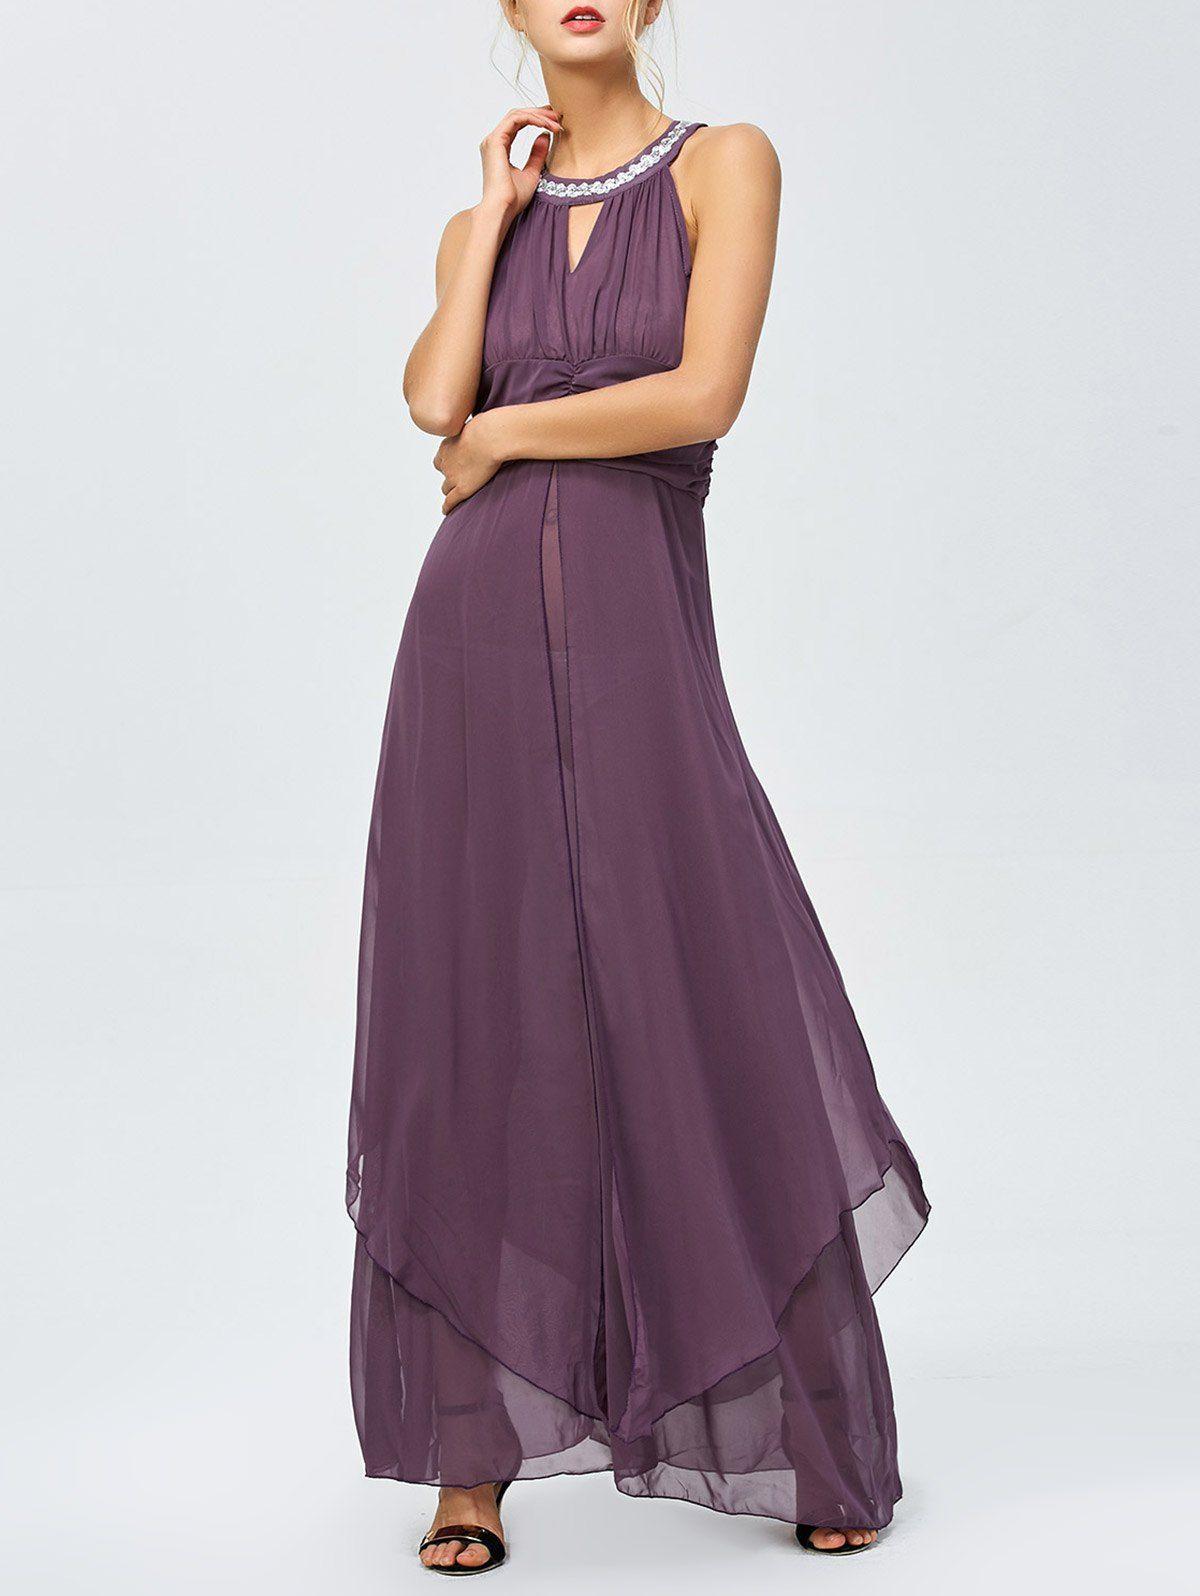 Ruched beaded seethrough maxi dress udud wish list u fun